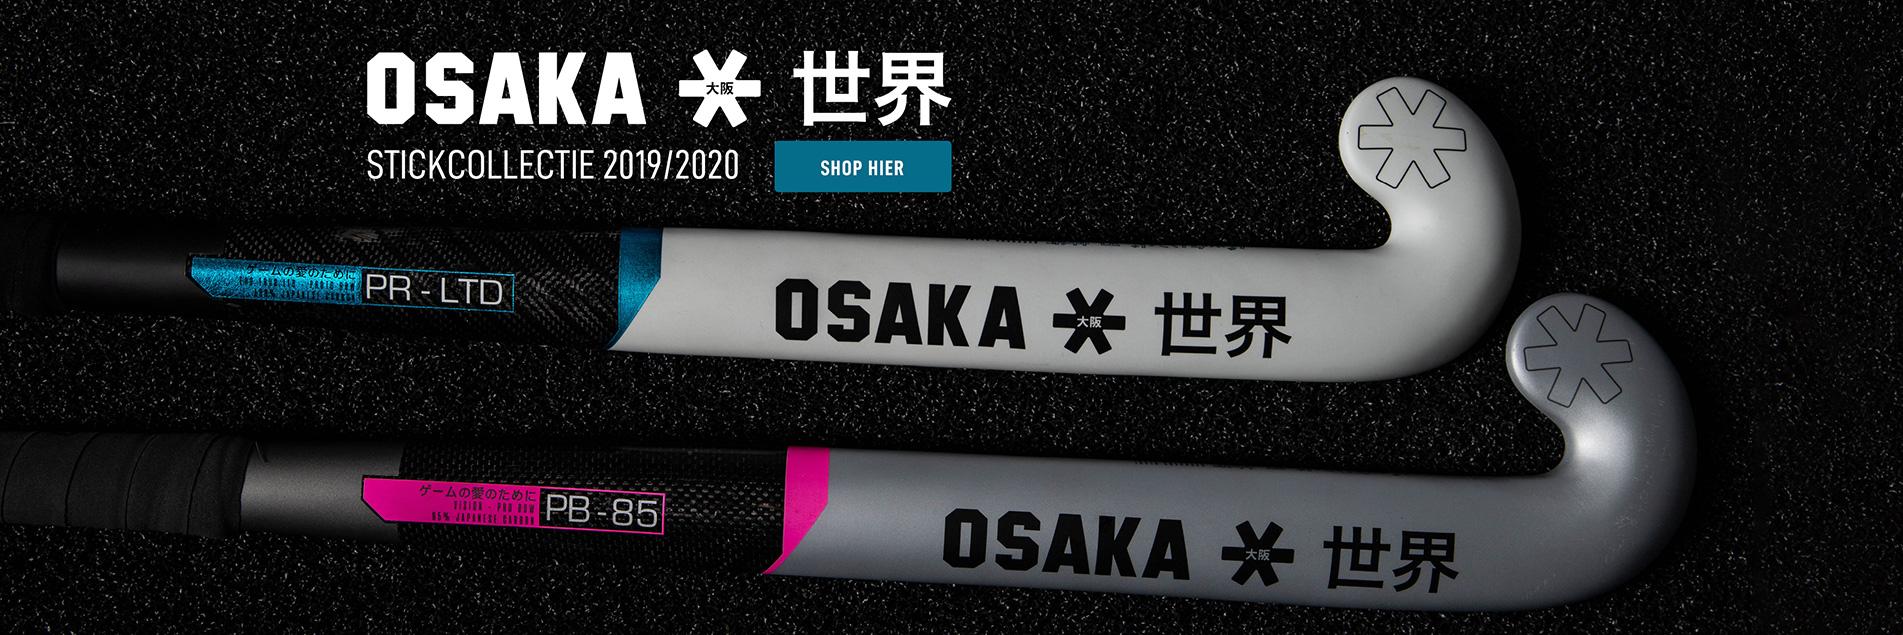 Osaka sticks